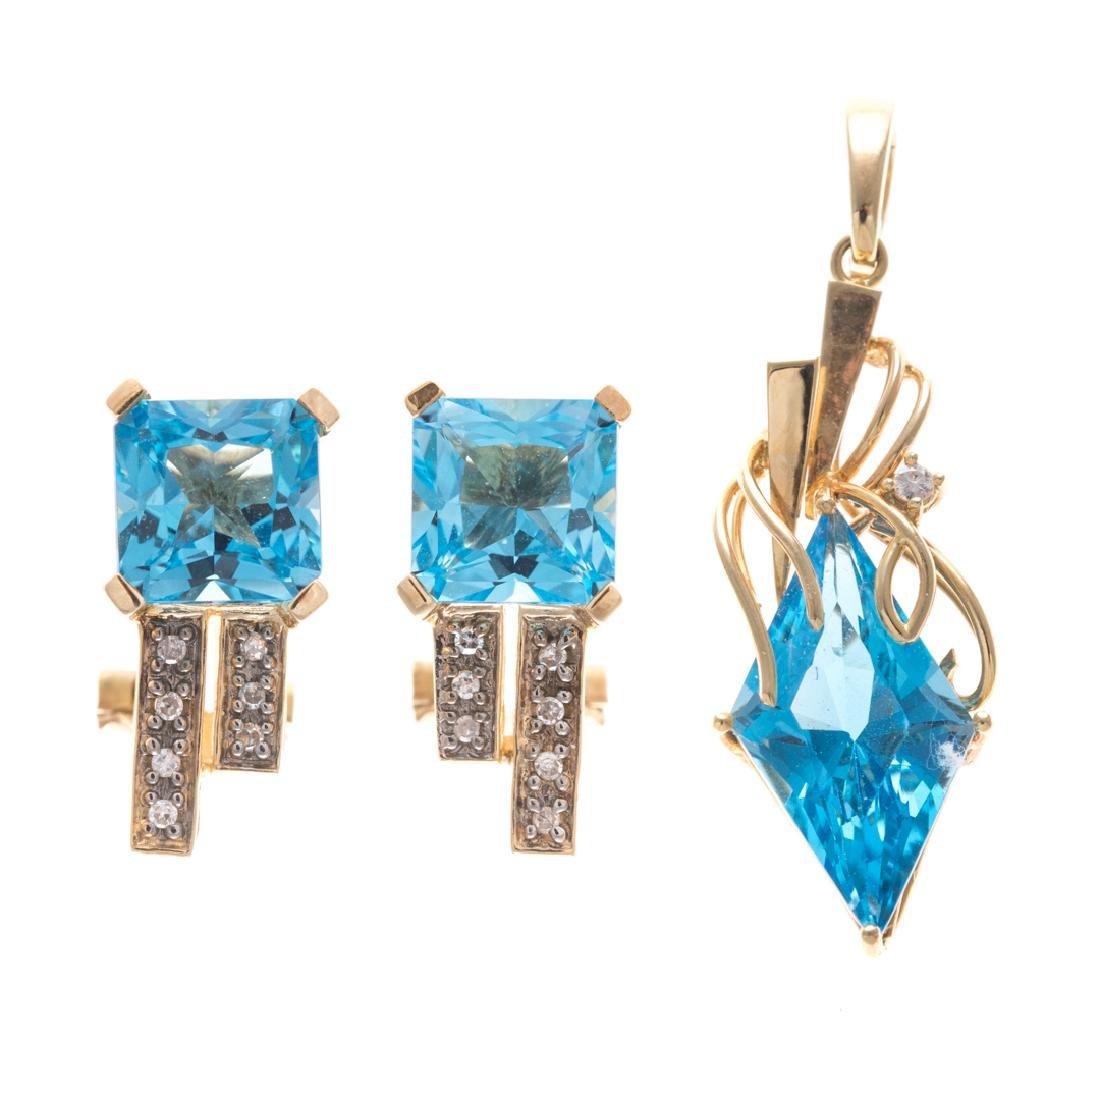 A Blue Topaz & Diamond Earring and Pendant Set